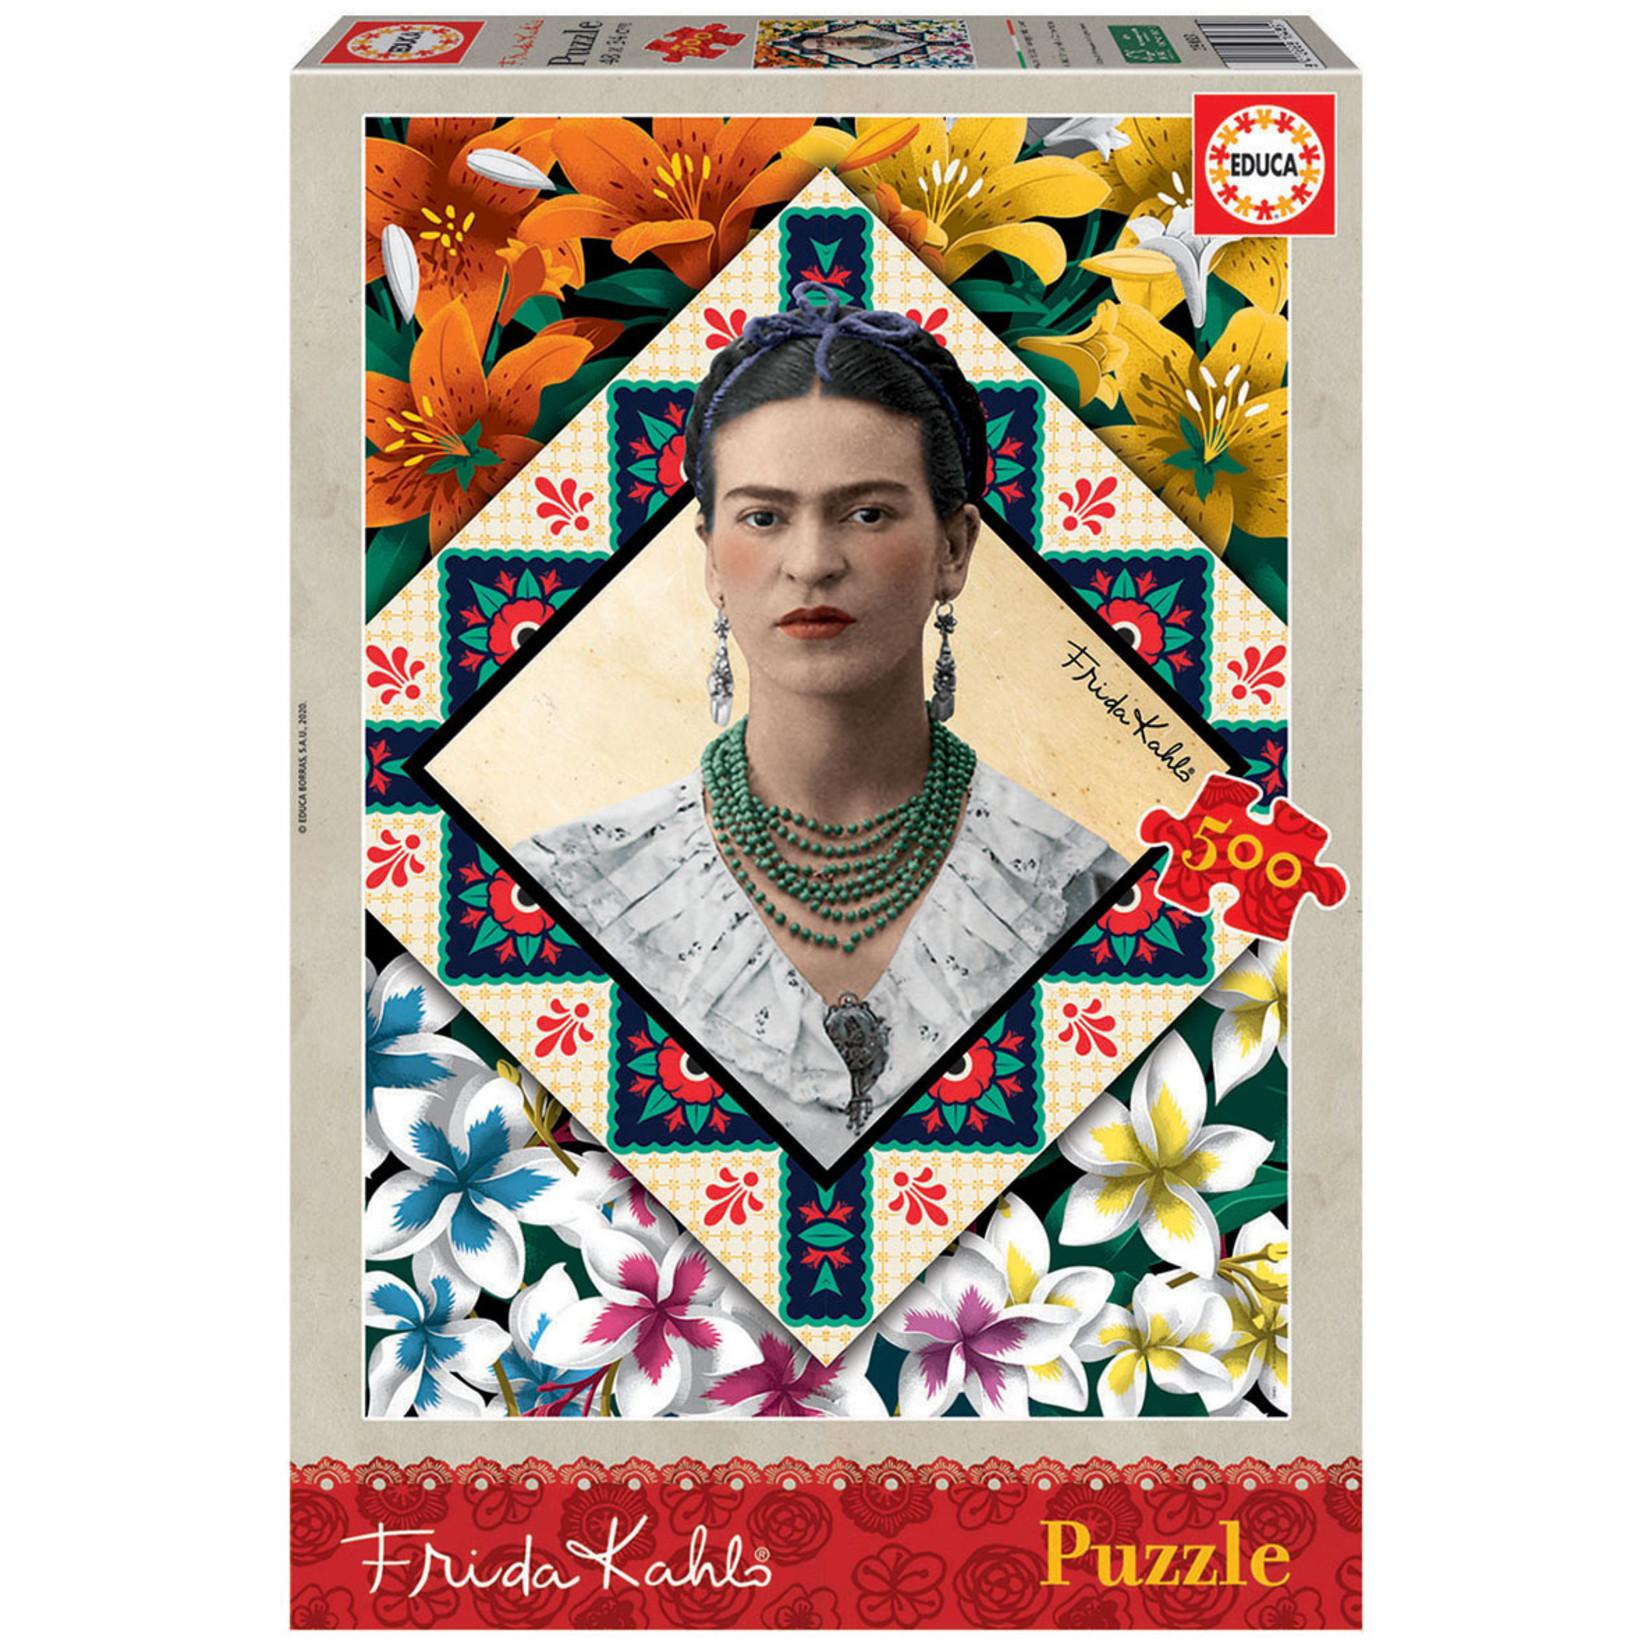 Educa Puzzles Frida Kahlo 500pc